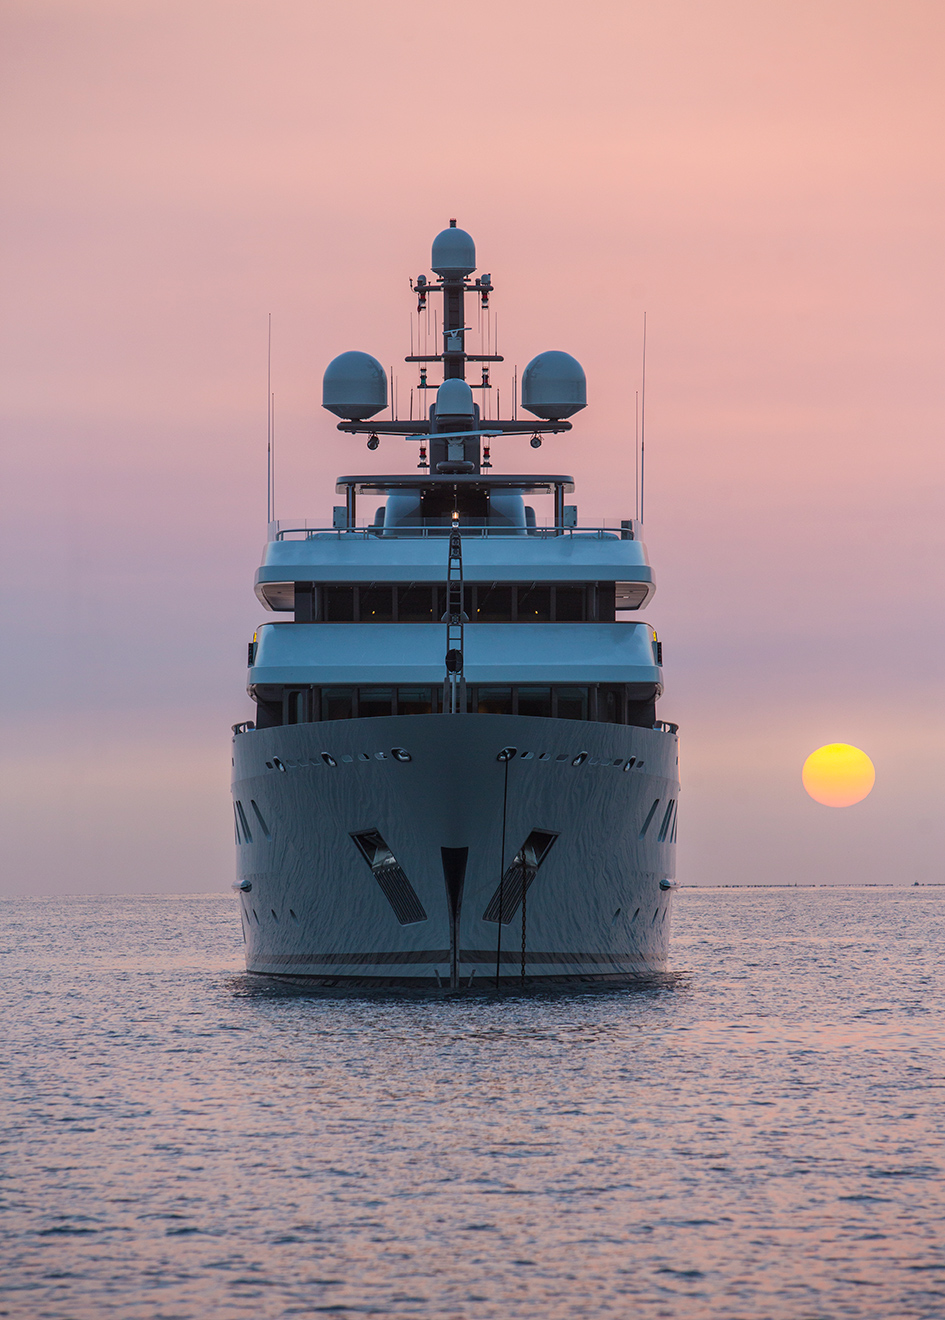 bow-view-of-the-lurssen-superyacht-polar-star